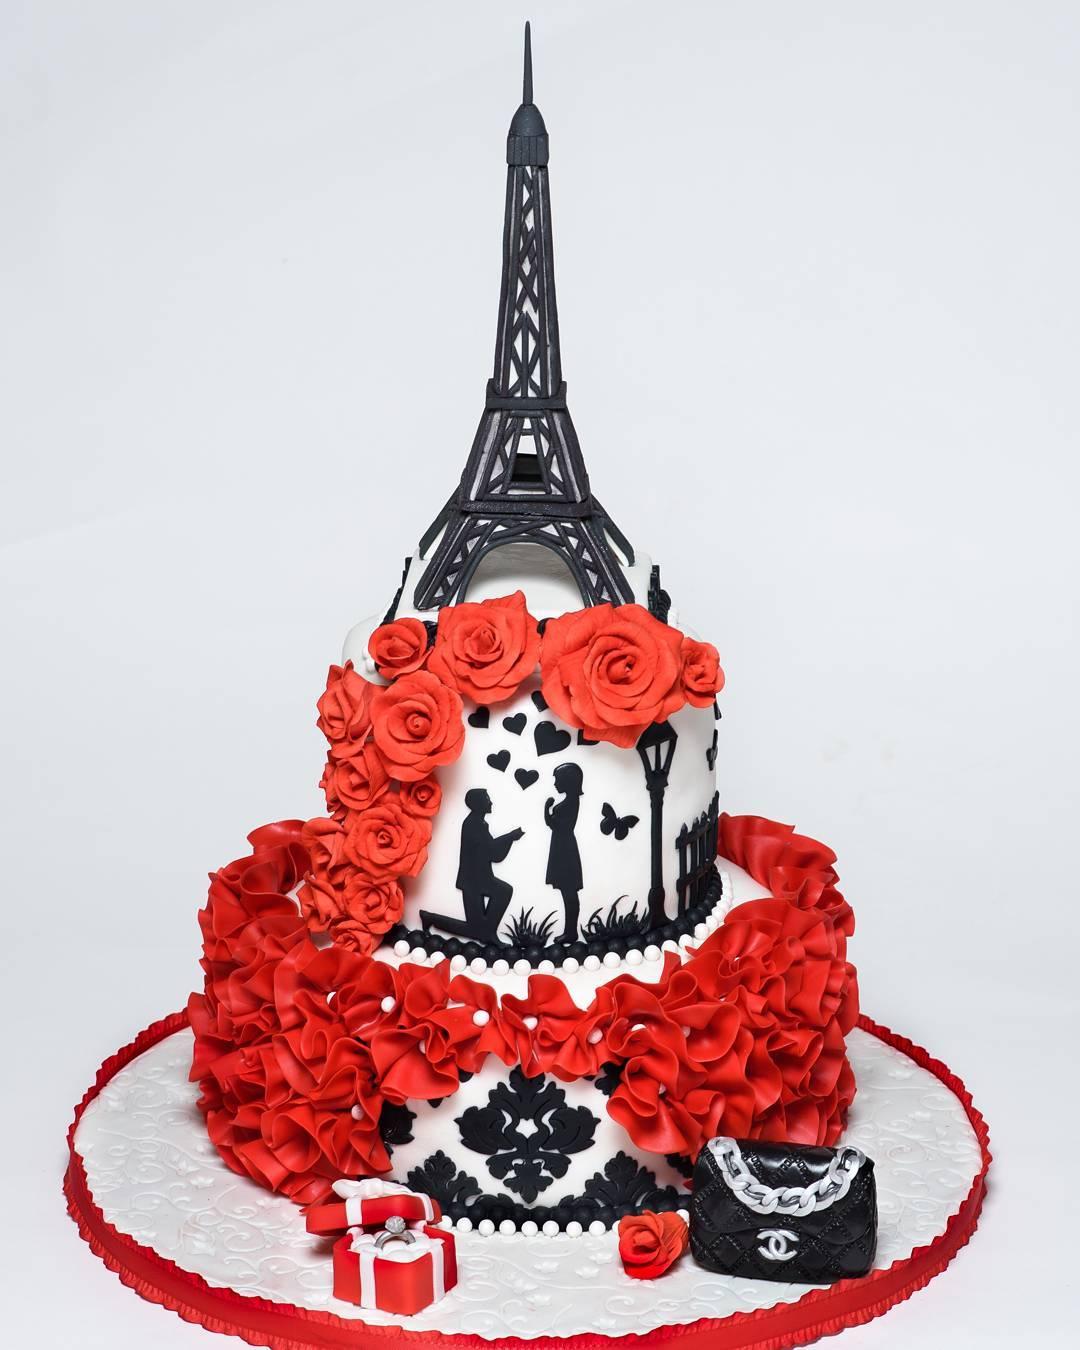 1556186714 OQRVRFCEJY - جشن تولدی رویایی با انتخاب بهترین تم تولد دخترانه